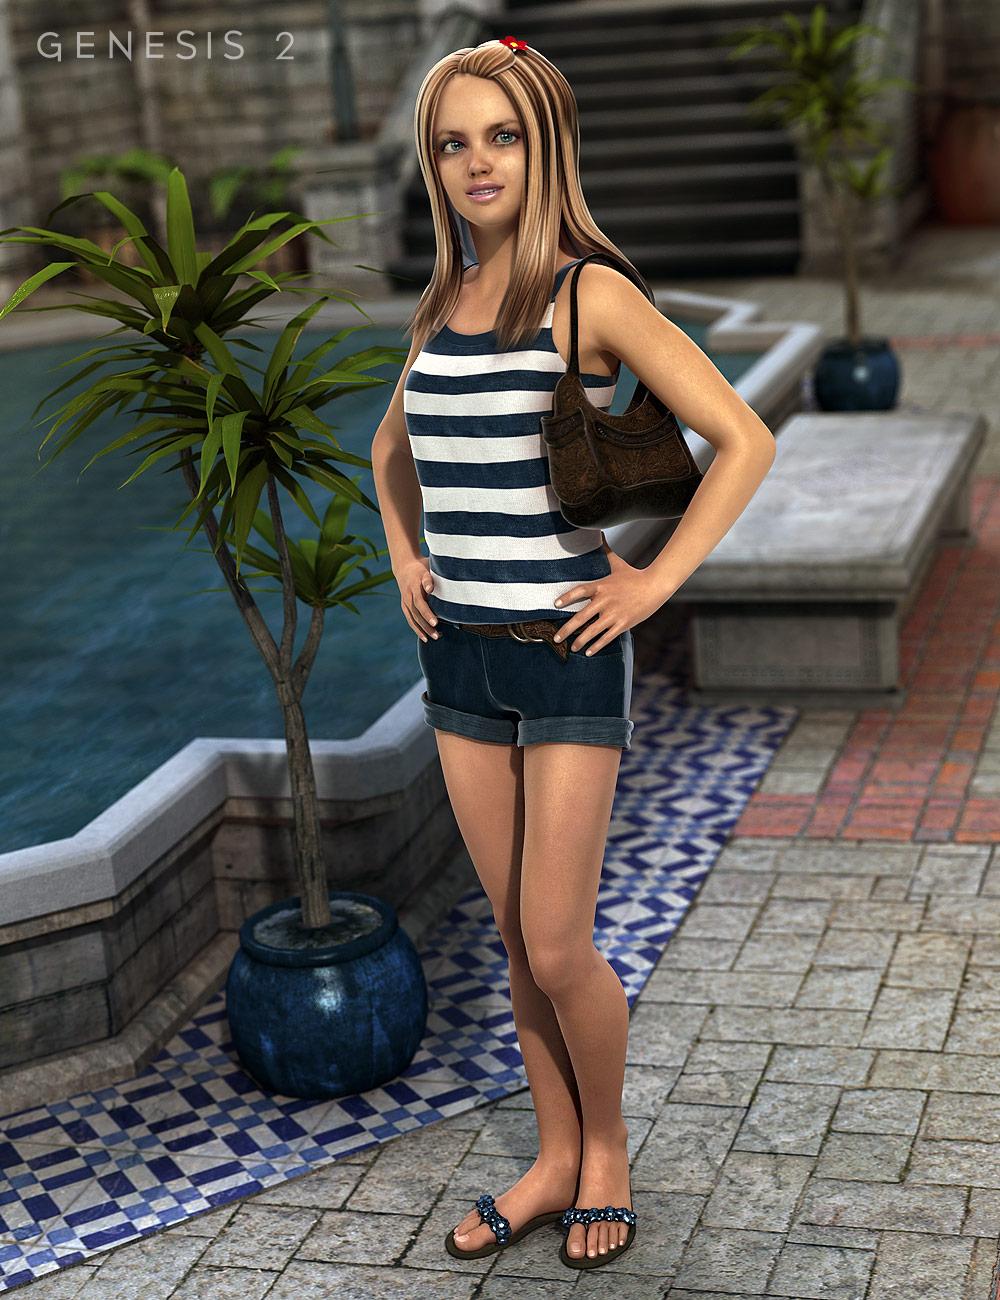 Boardwalk Outfit for Genesis 2 Female(s) by: Barbara BrundonSarsa, 3D Models by Daz 3D